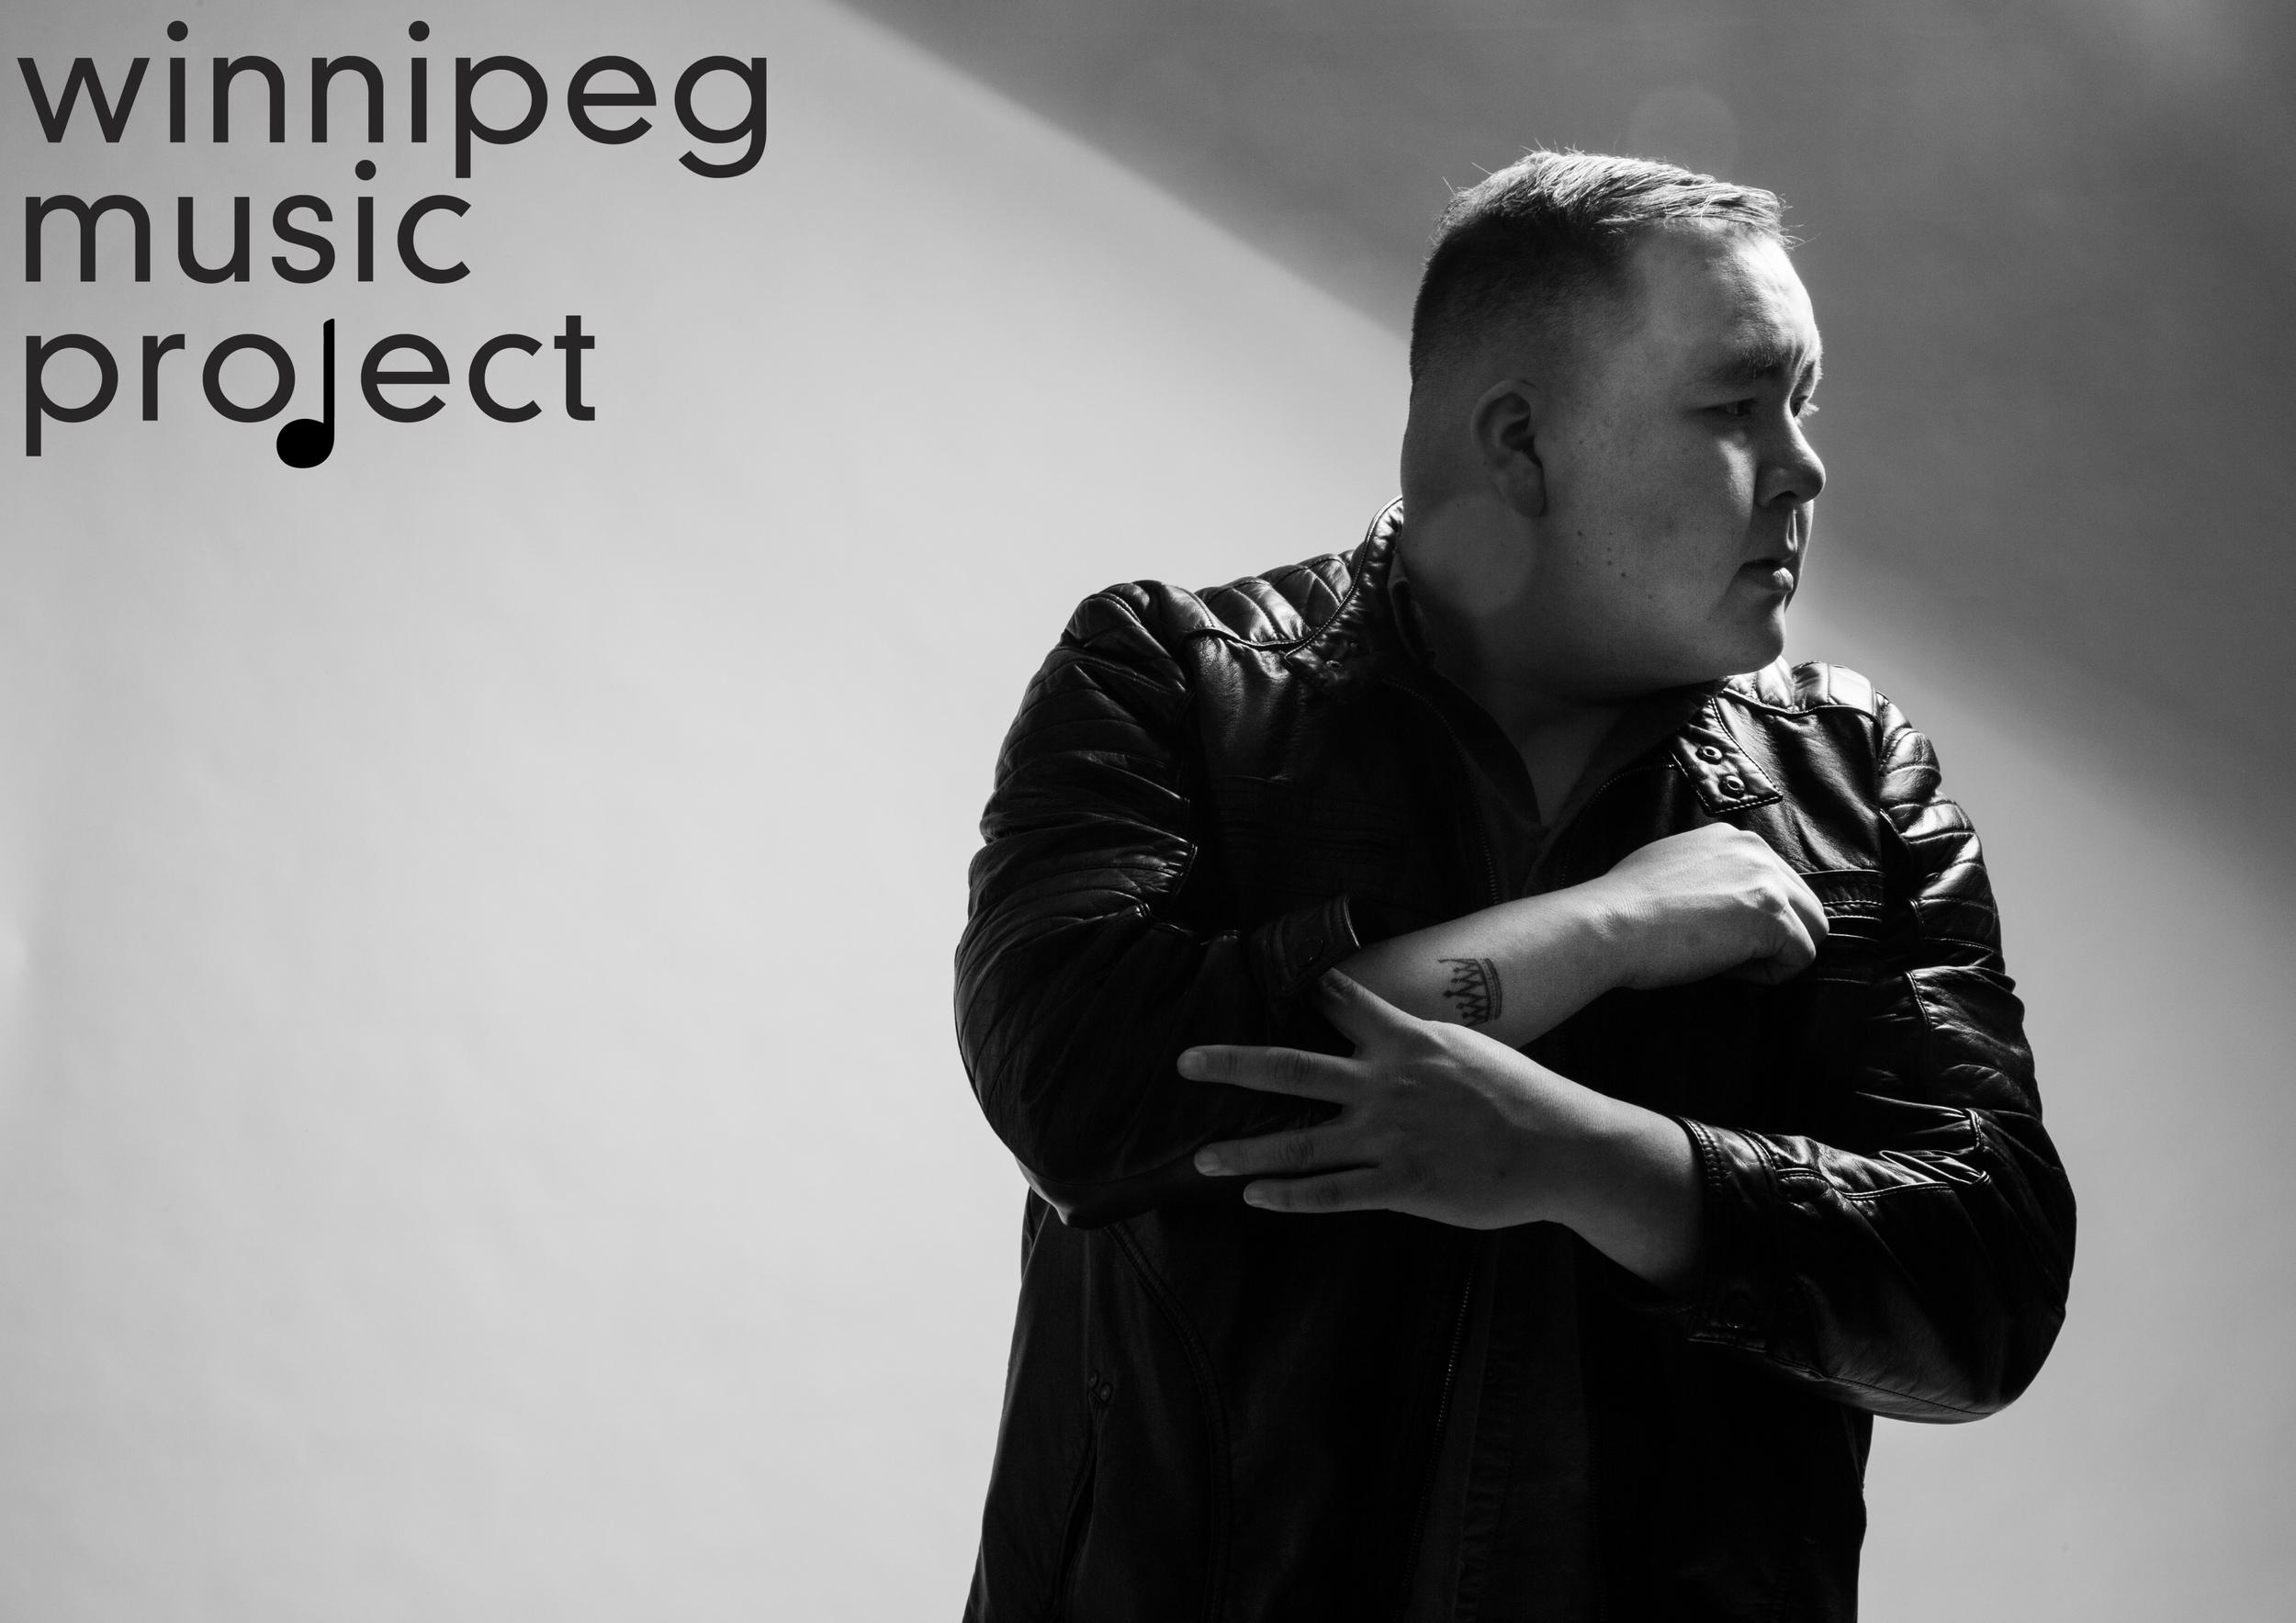 www.ashleybieniarz.com - Pianist   Singer-Songwriter   Winnipeg Music Blogger William Prince